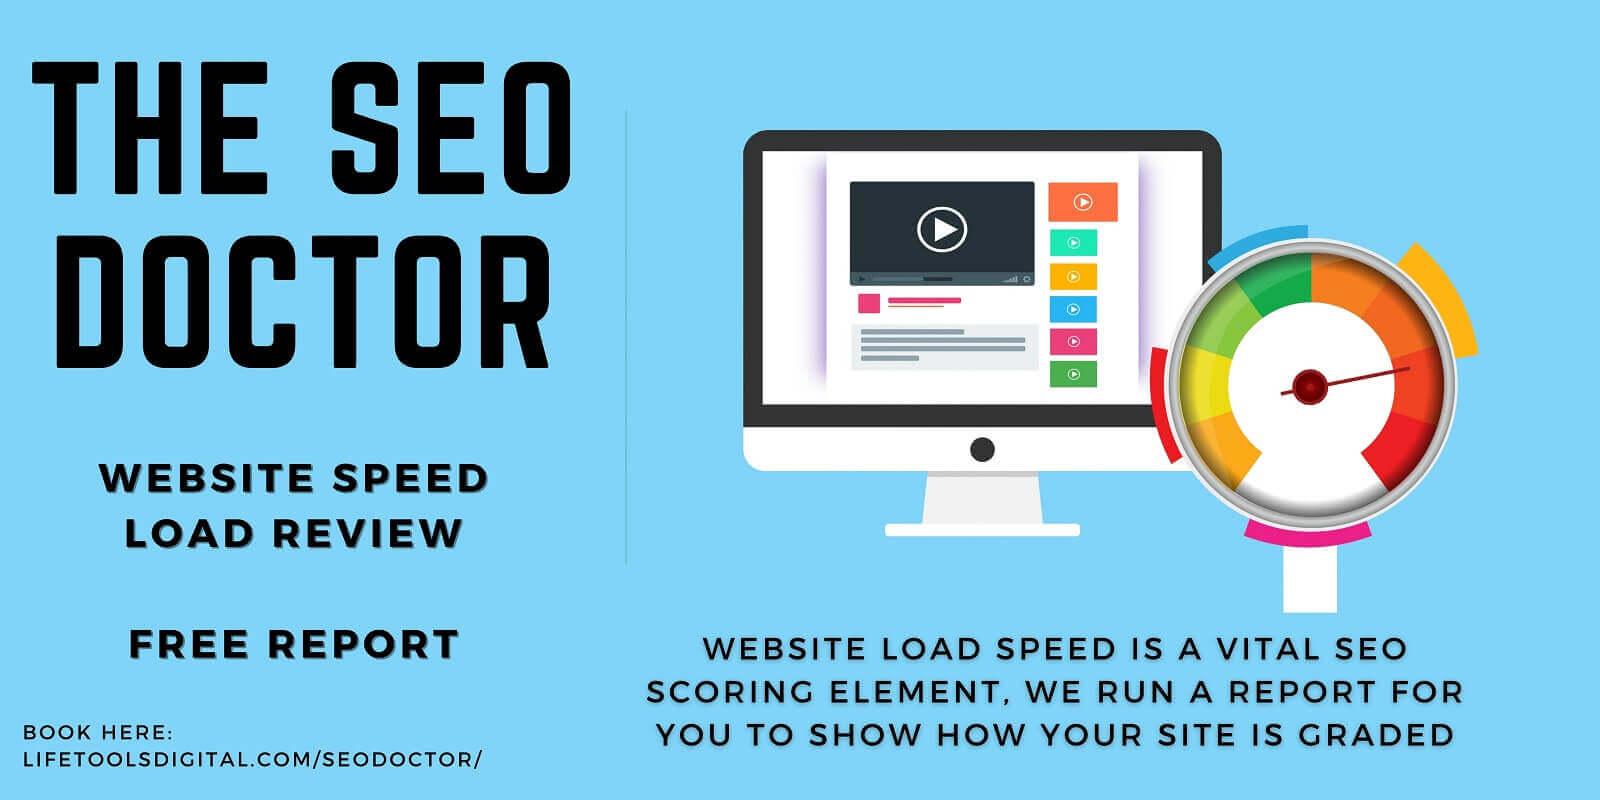 SEO Doctor Website Speed Loading Report